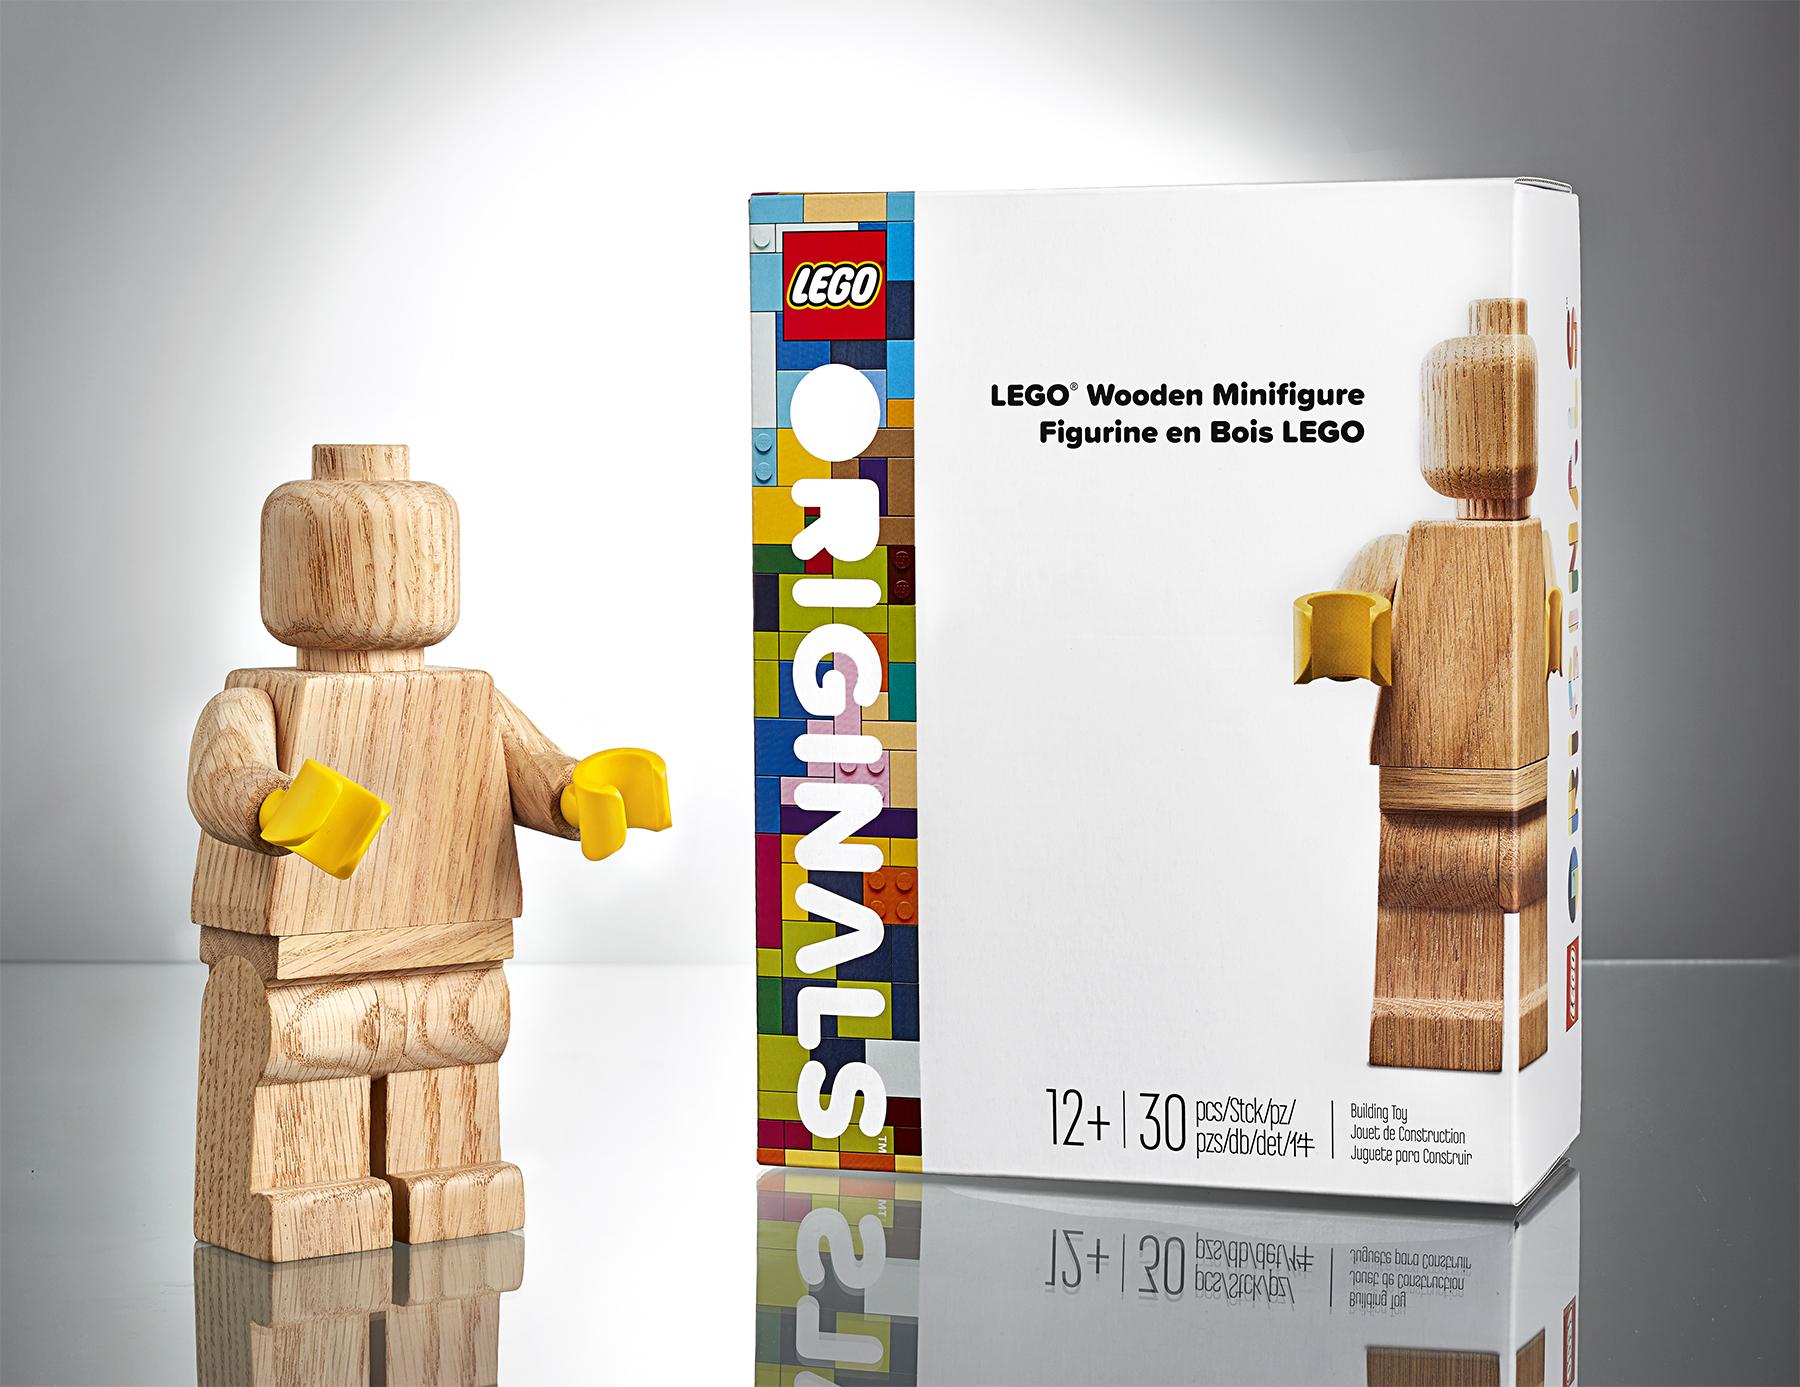 lego-originals-minifigure-and-box